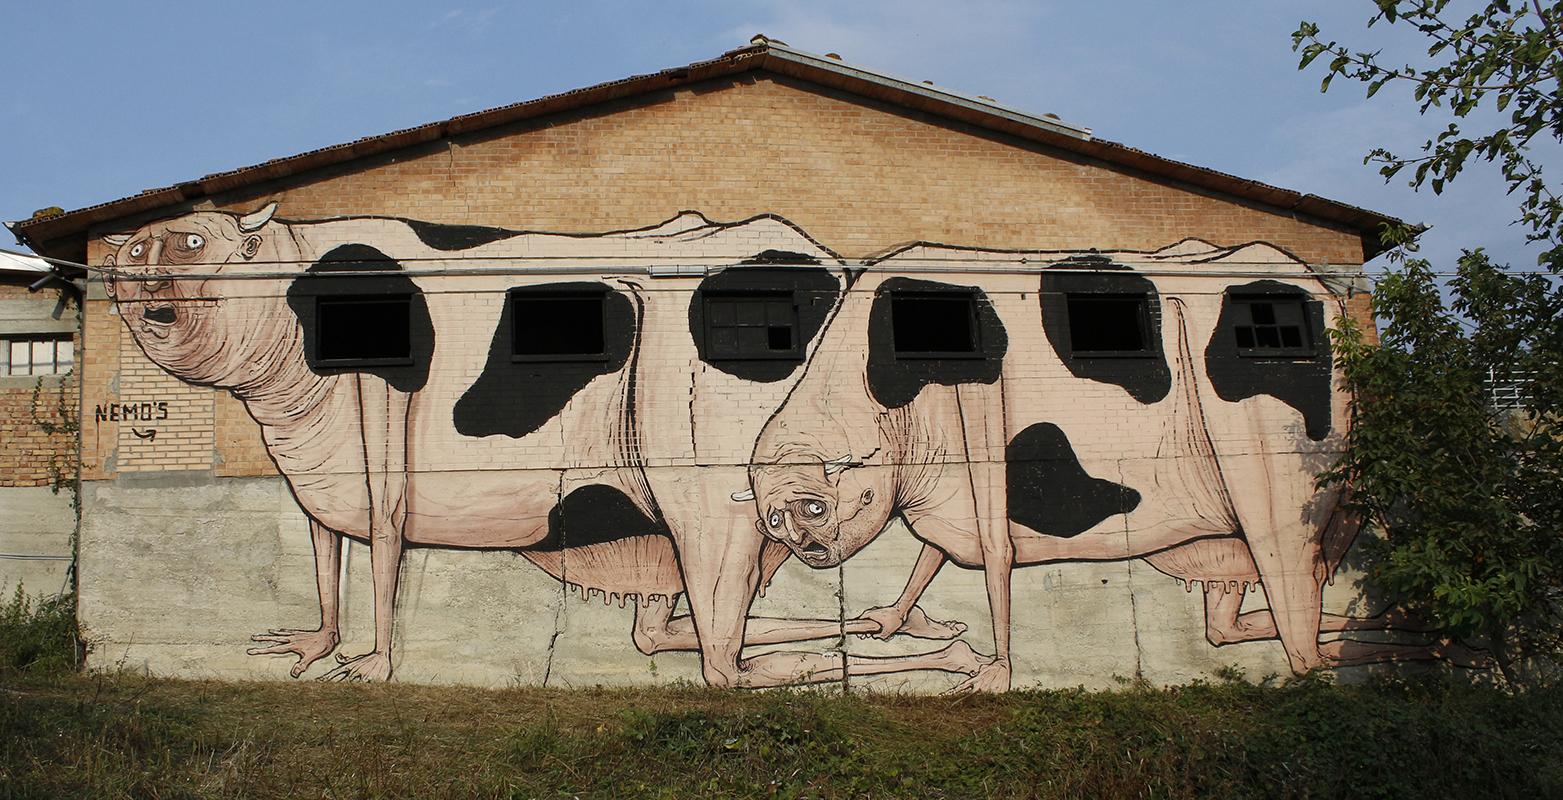 nemos-new-murals-for-sagra-della-street-art-01